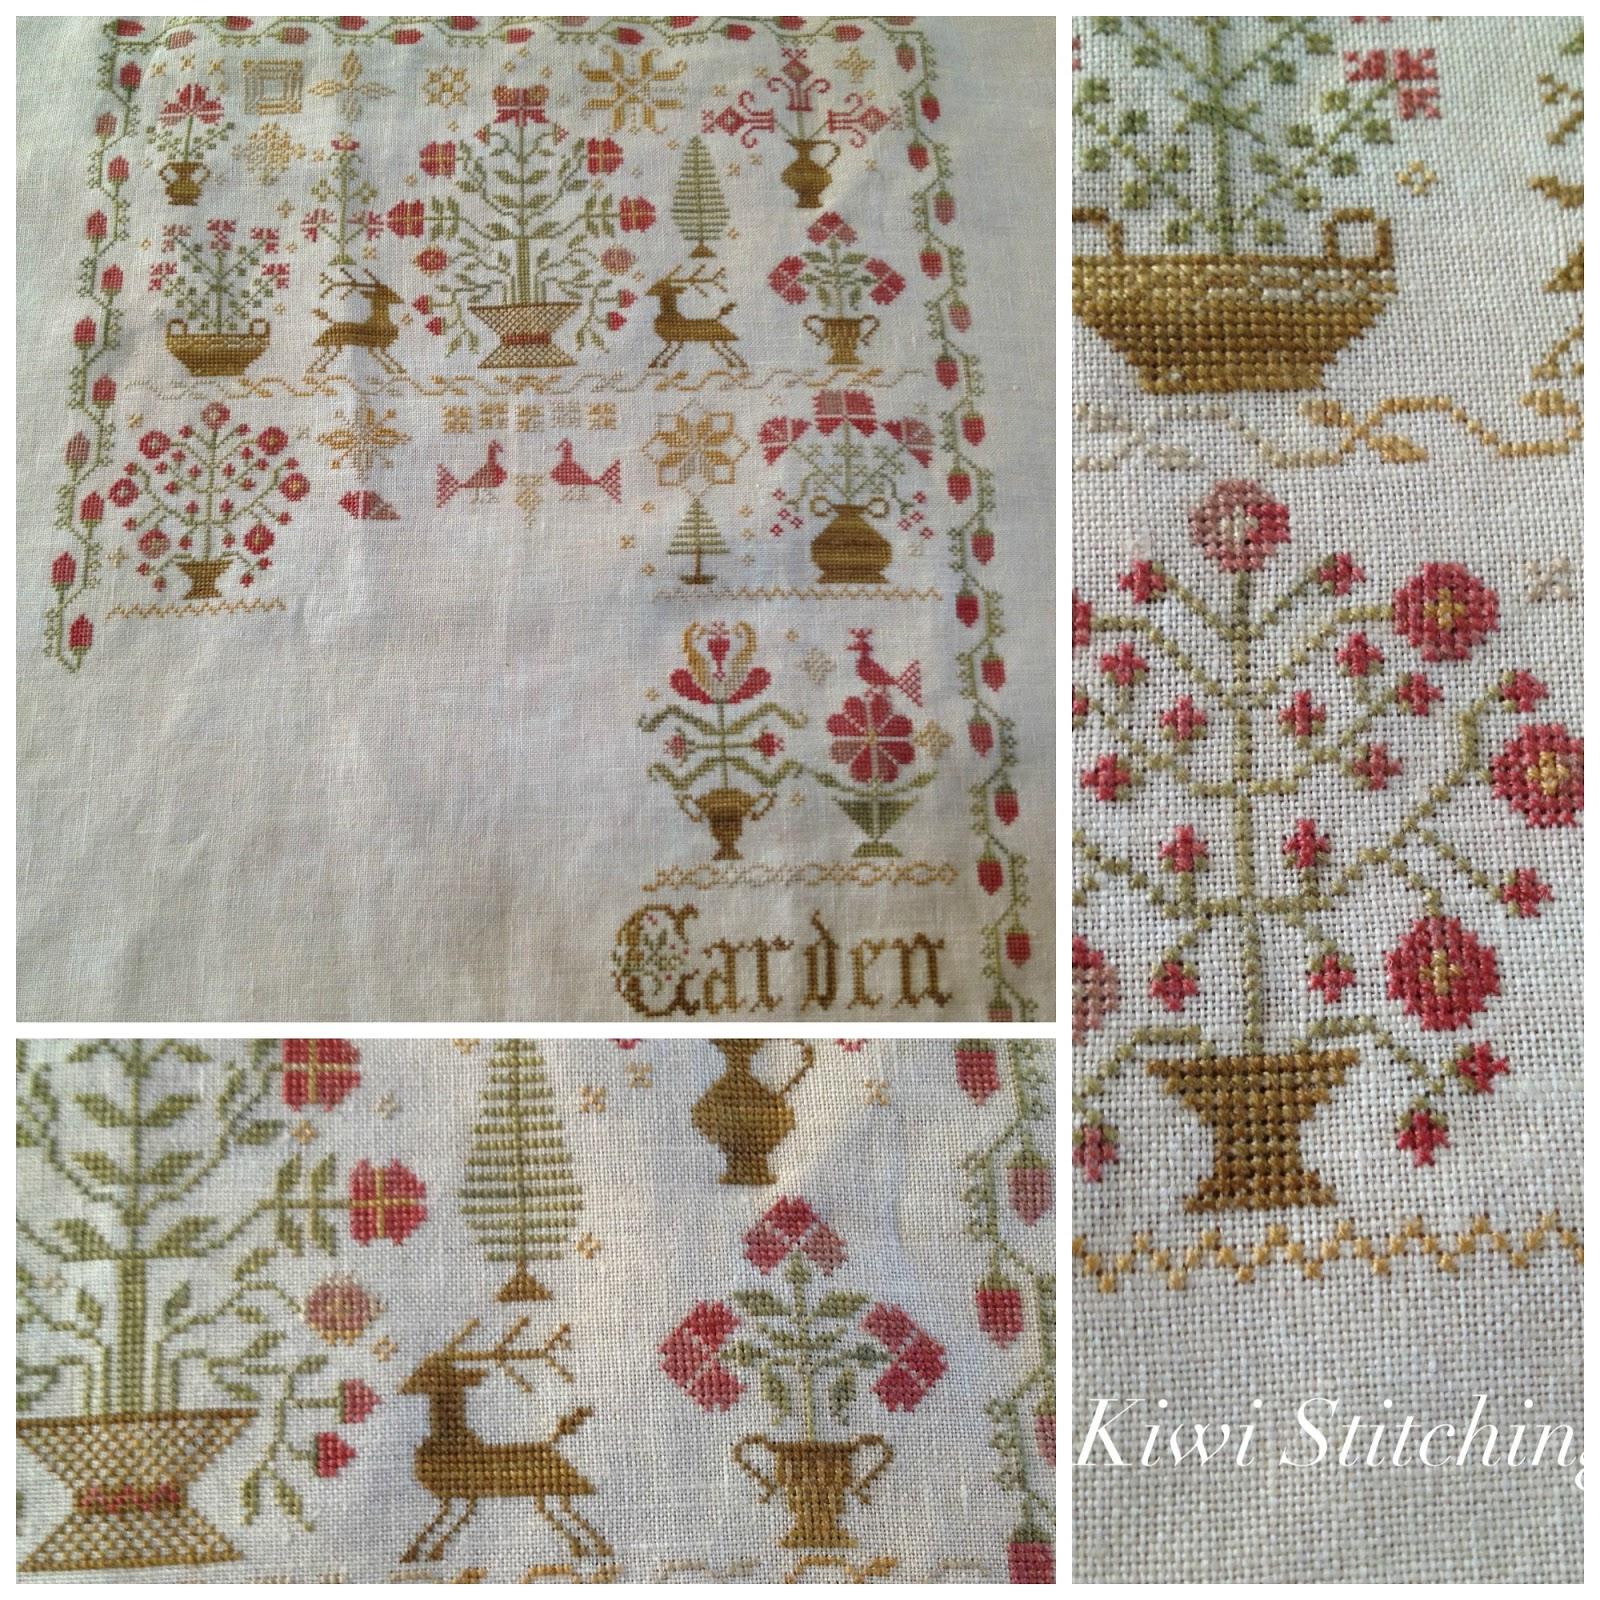 A kiwi stitching christmas garden update for Christmas garden blackbird designs